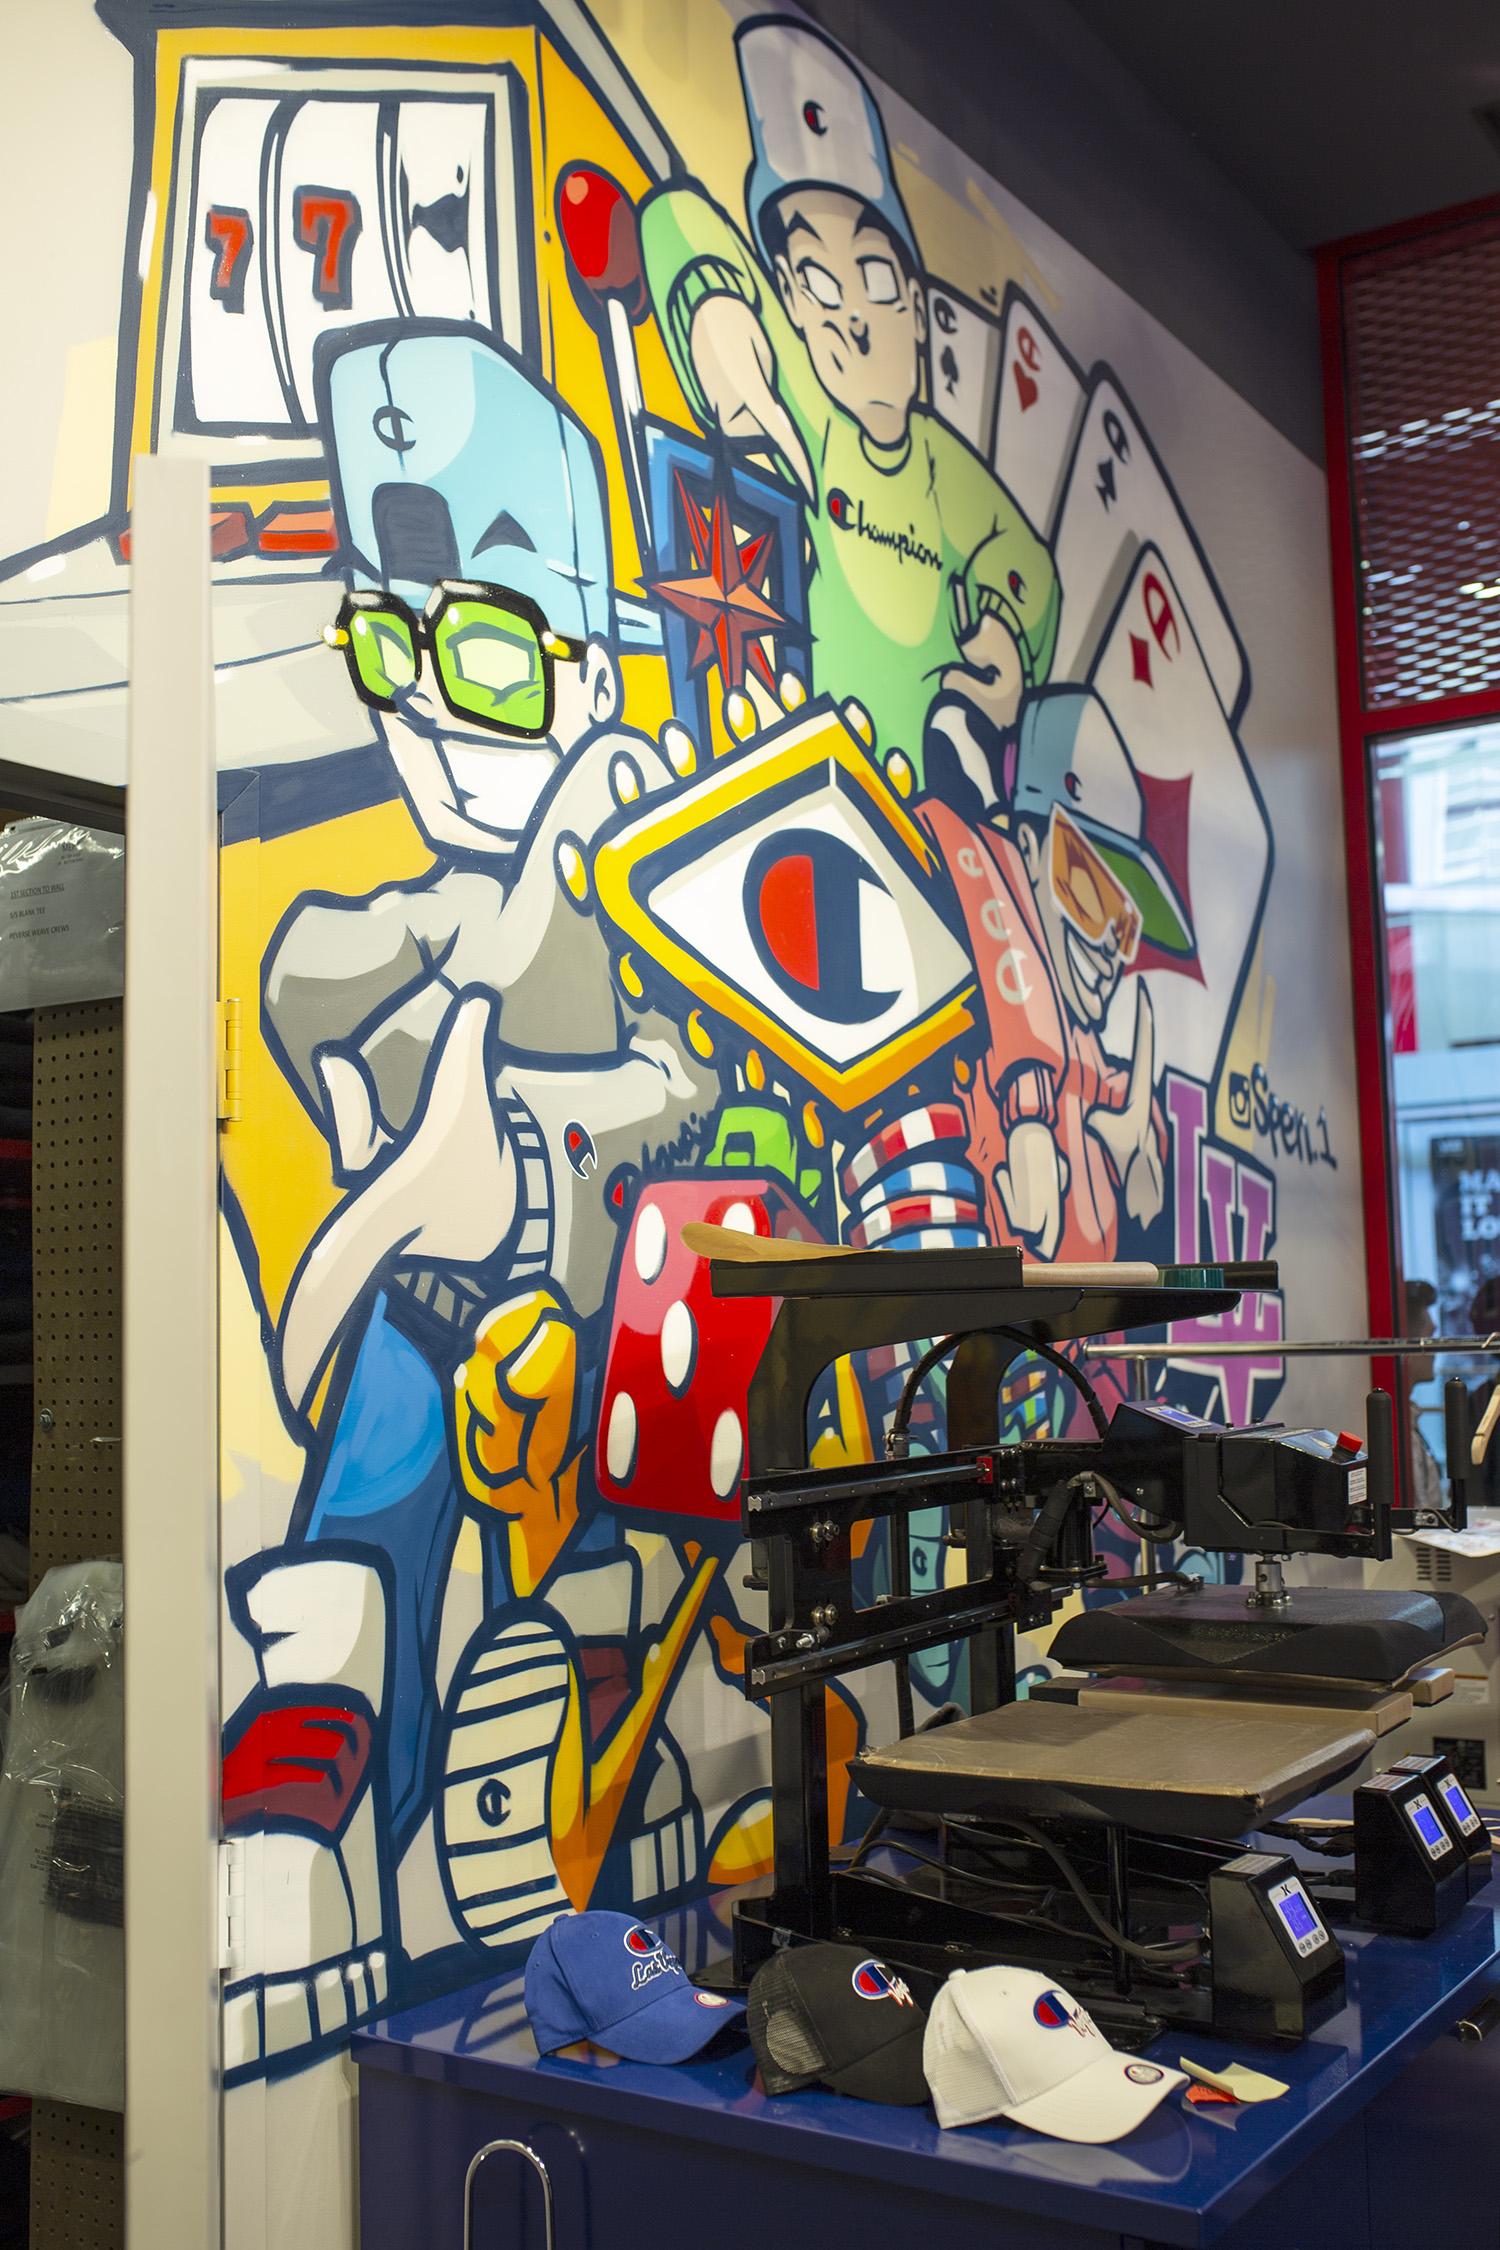 Las Vegas Graffiti Artist for Hire